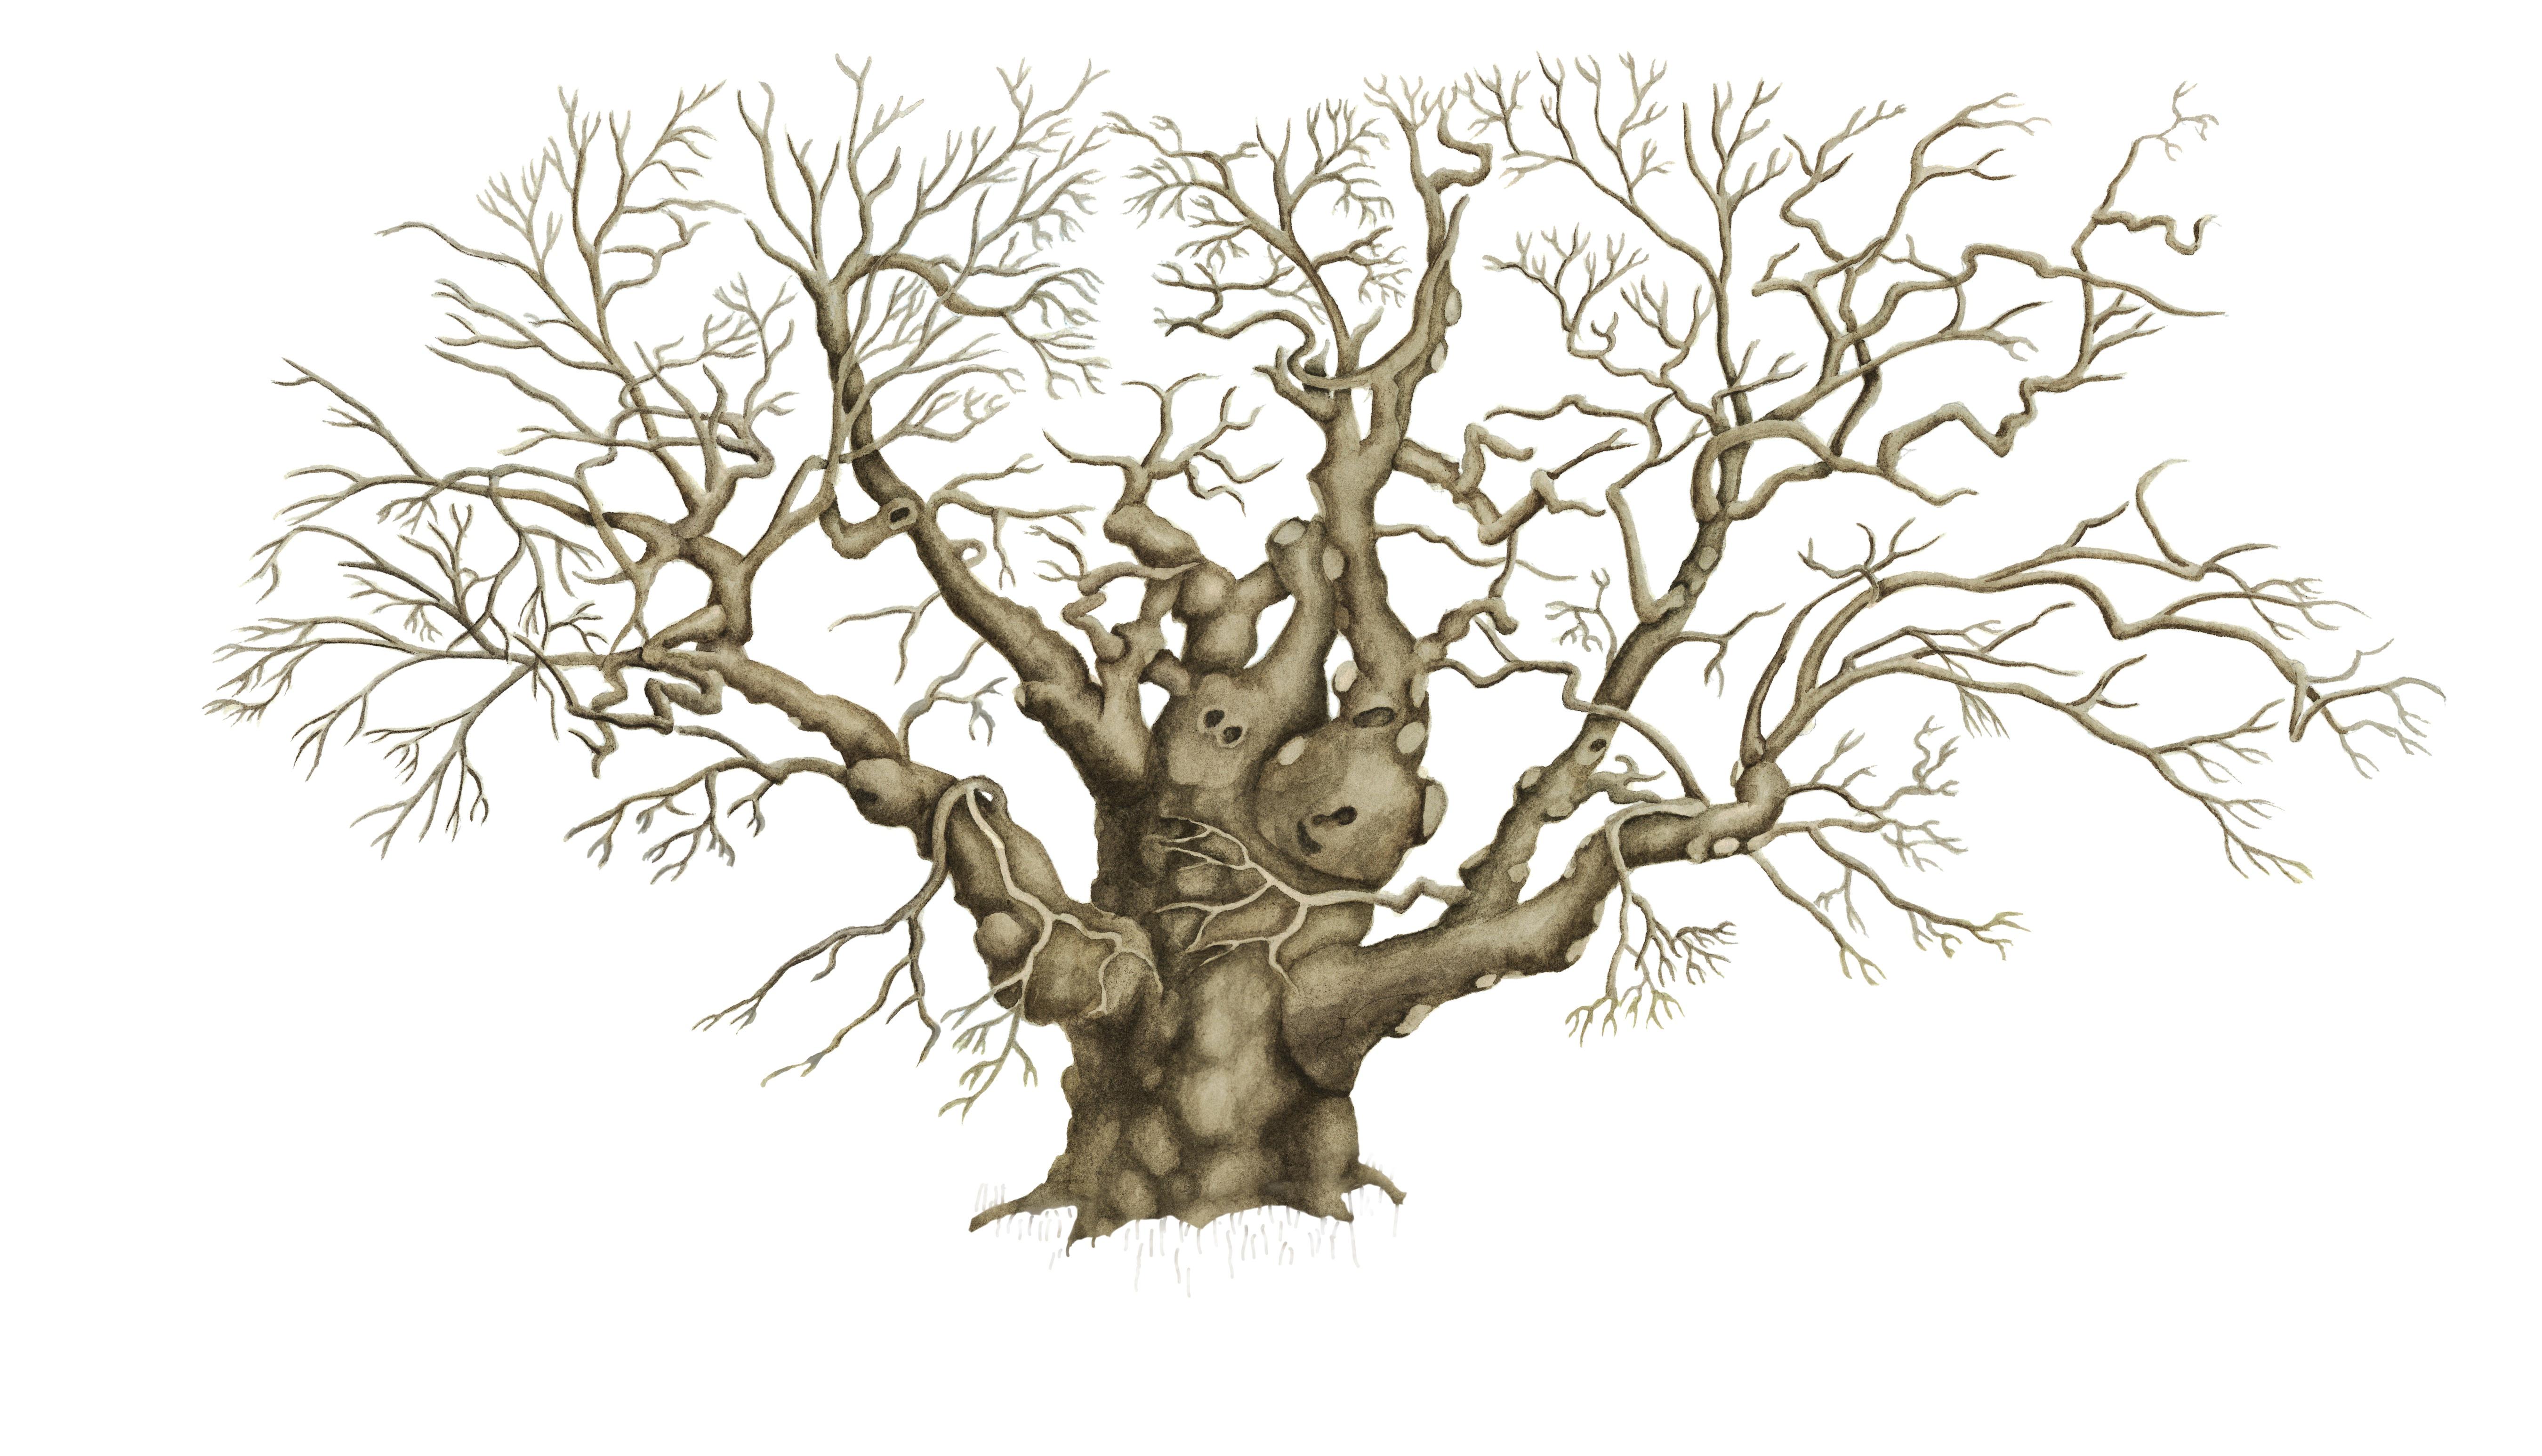 5400x3093 Old Oak Tree Drawing Savannah Candler Live Oak Tree Pen And Ink